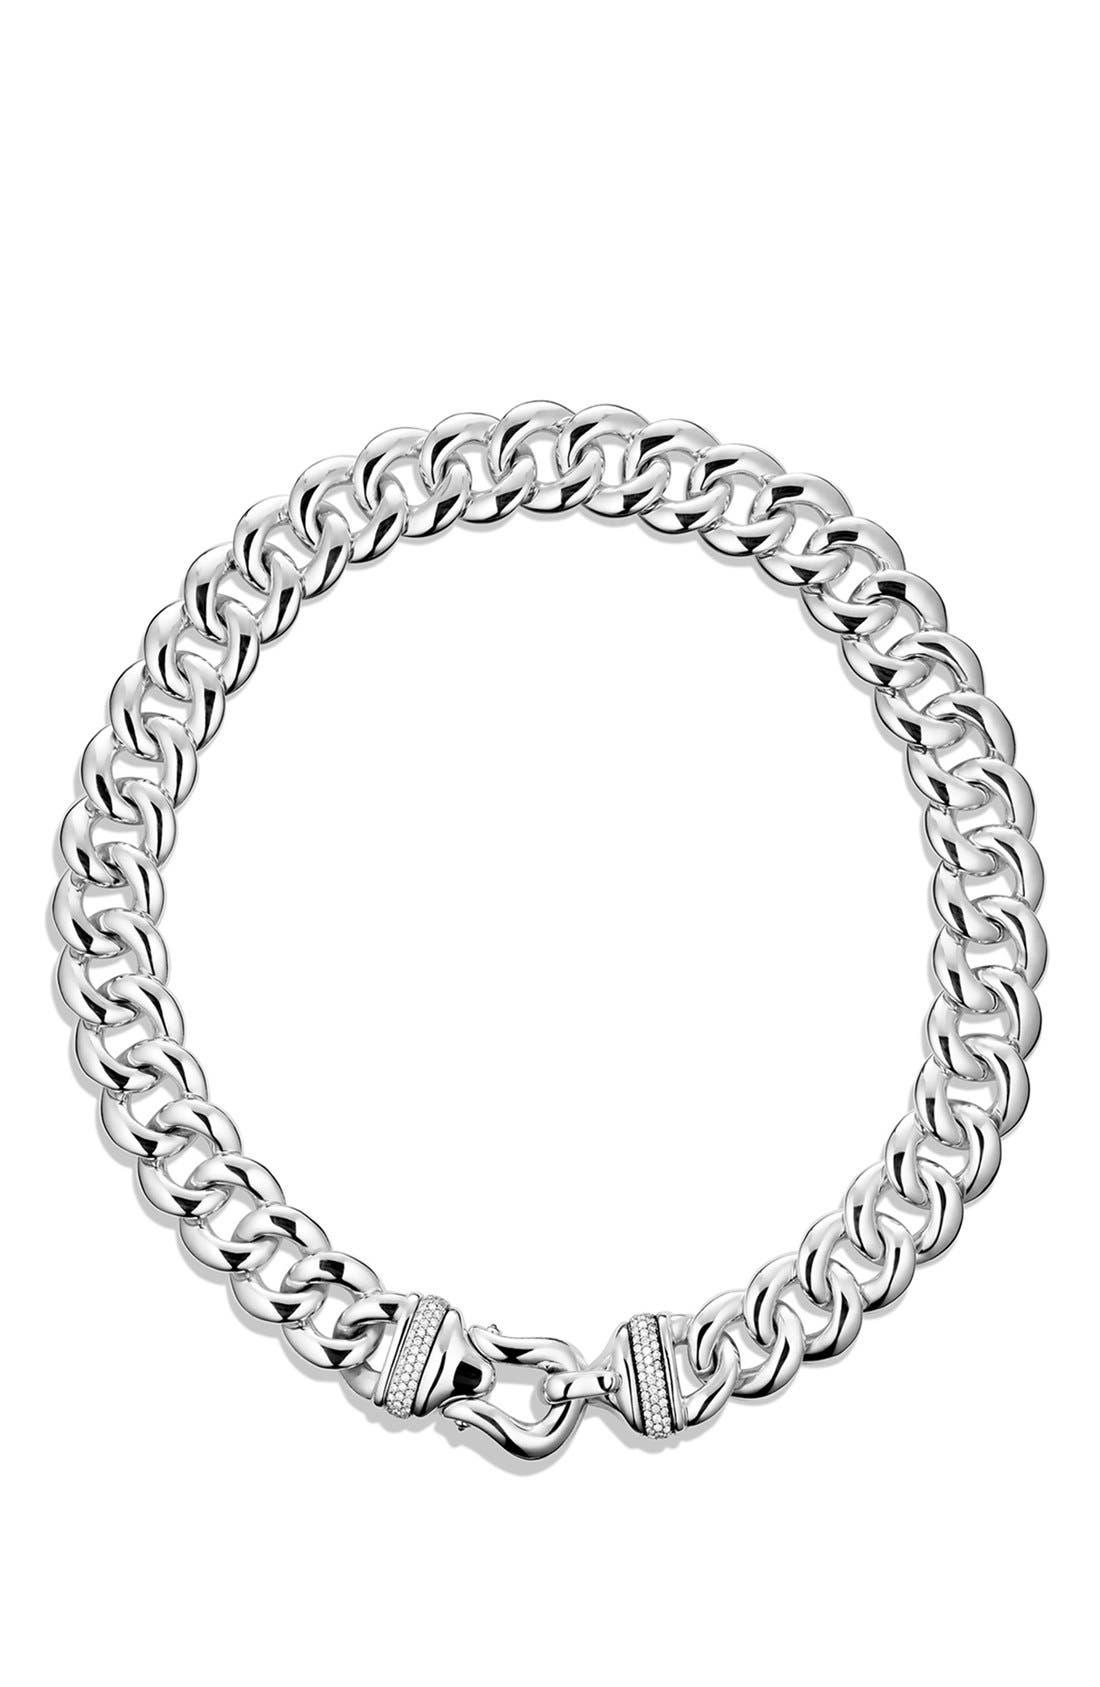 Alternate Image 1 Selected - David Yurman 'Buckle' Chain Necklace with Diamonds